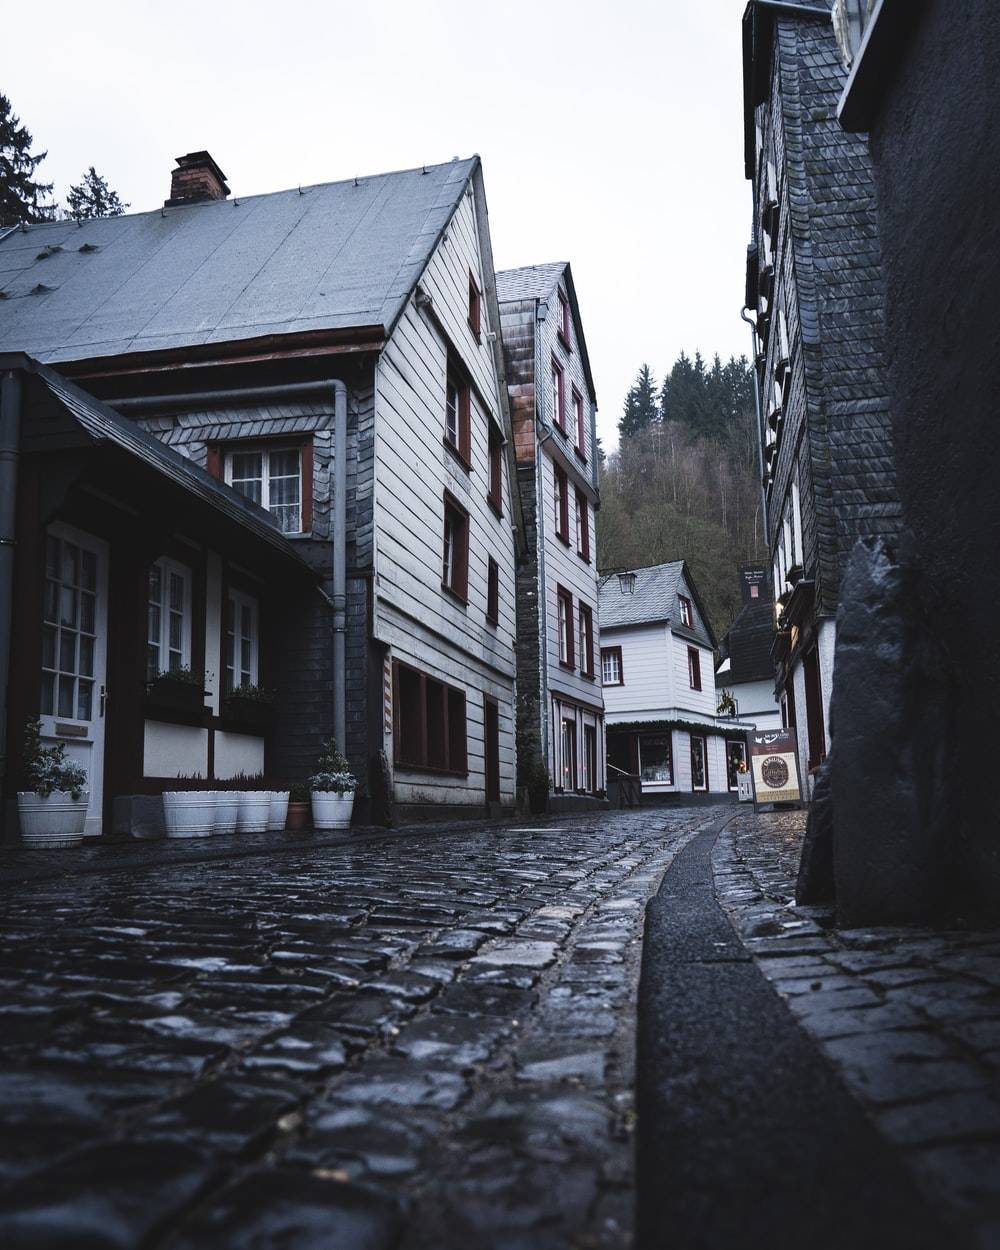 empty narrow street during daytime